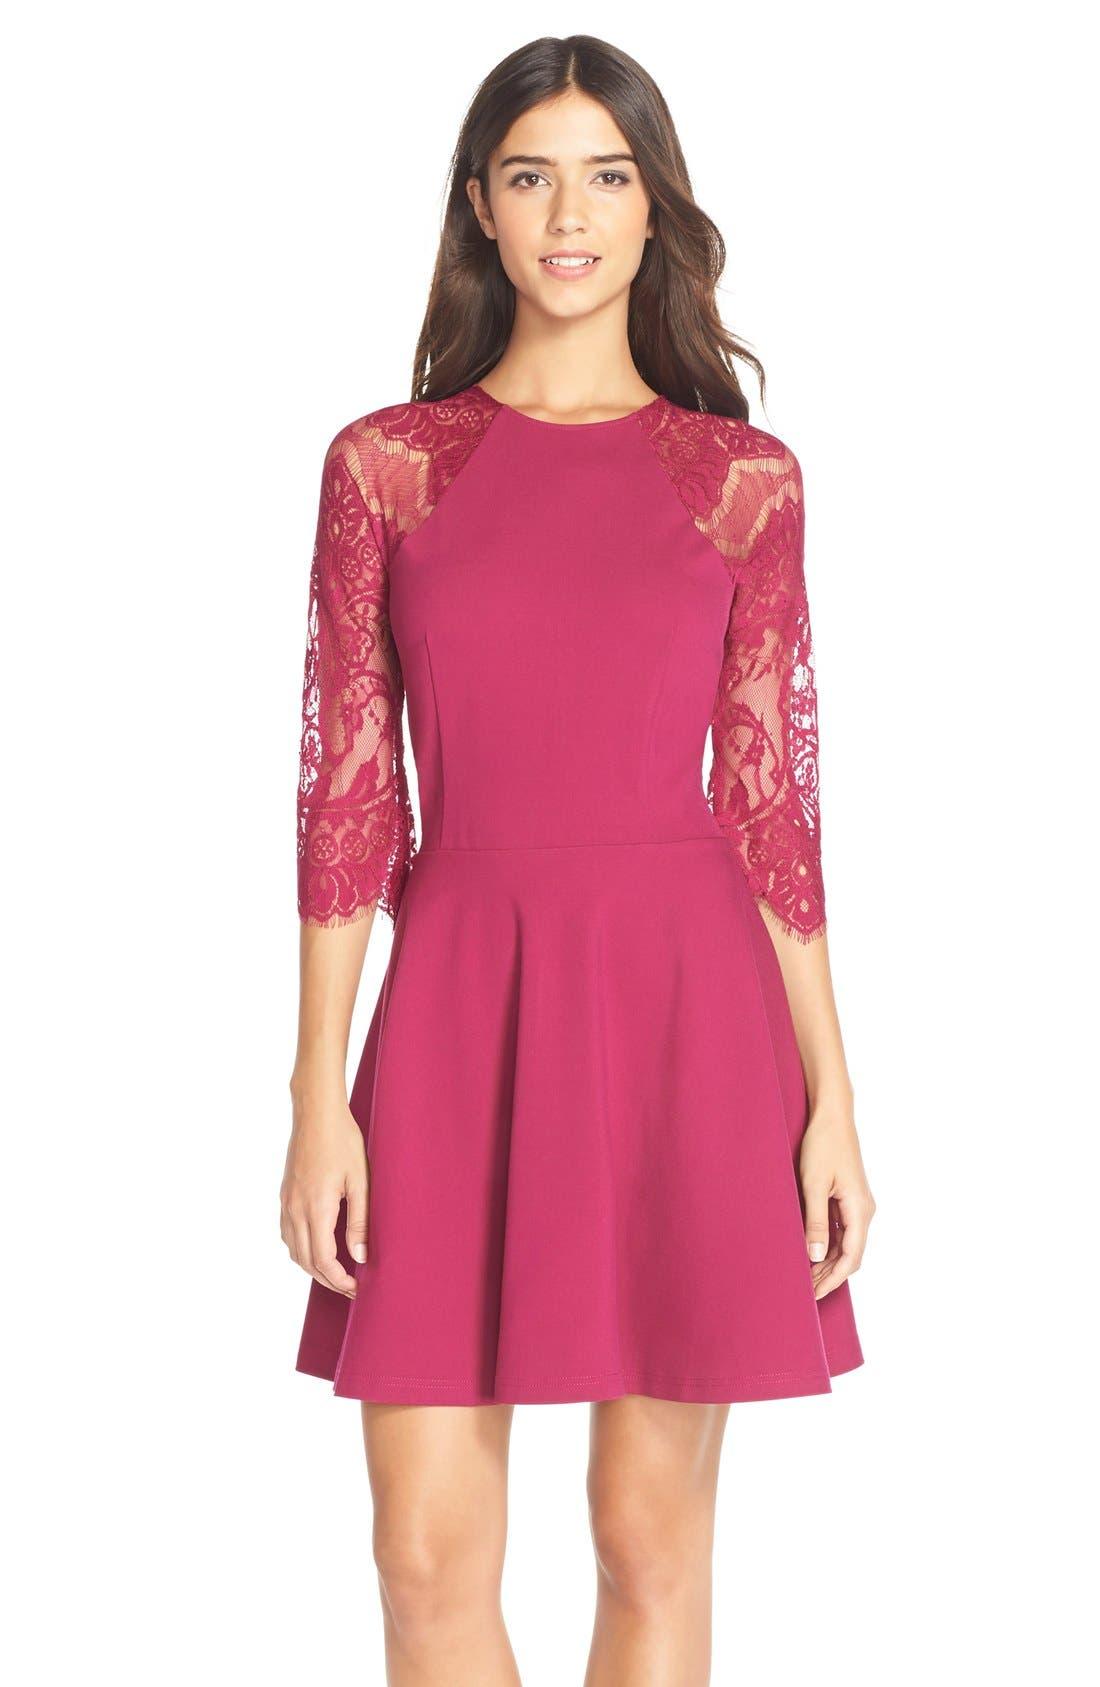 Alternate Image 1 Selected - BB Dakota 'Yale' Lace Panel Fit & Flare Dress